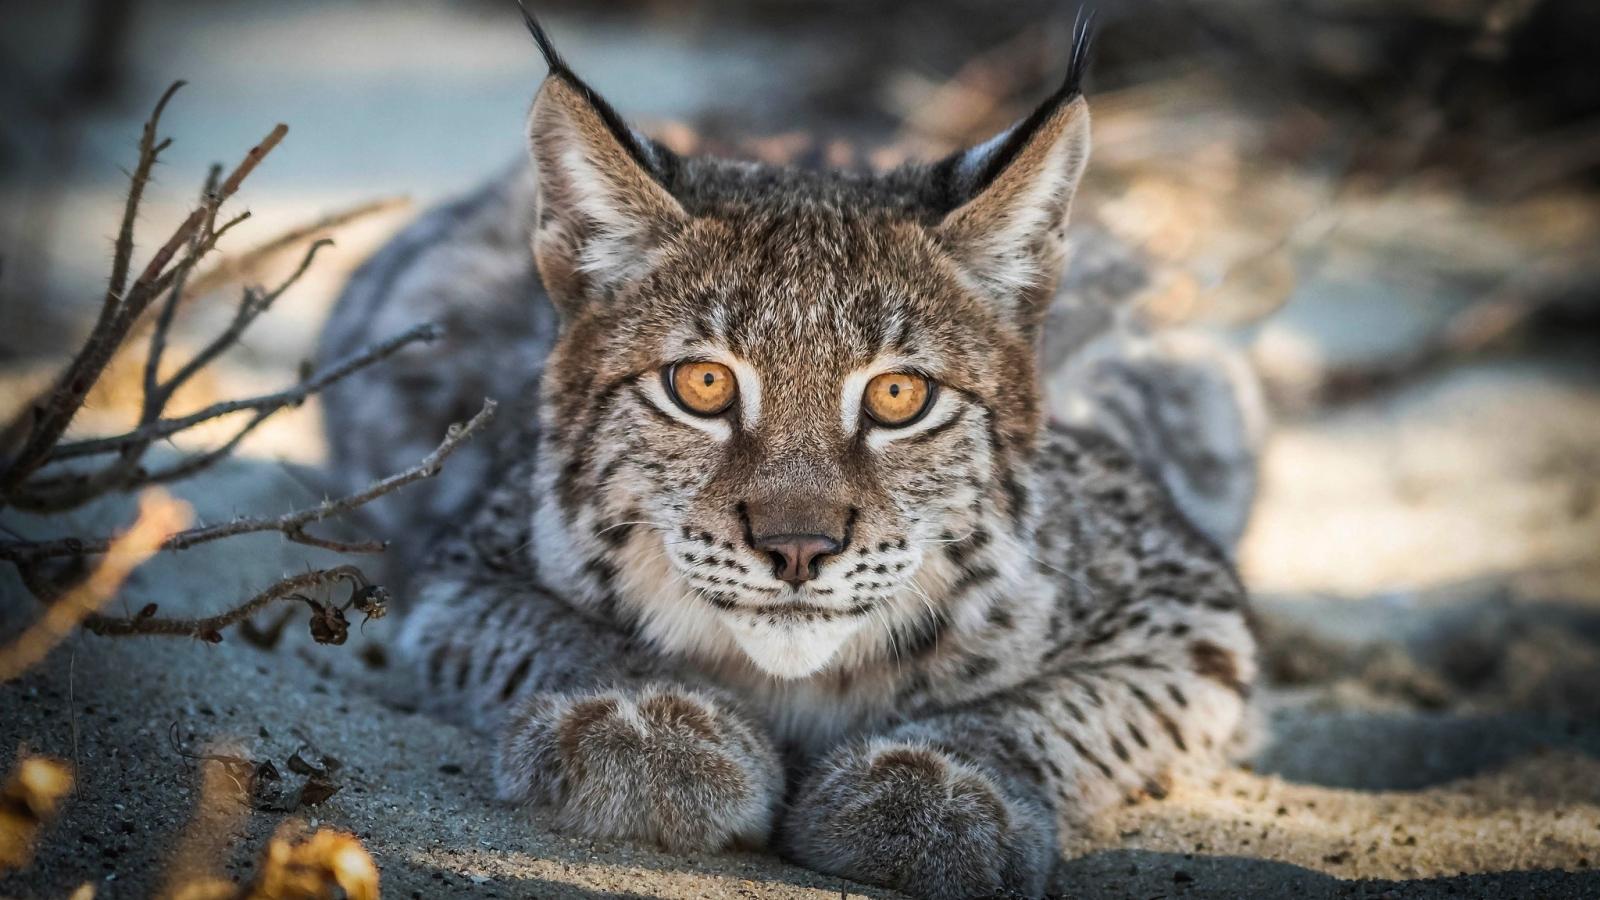 Close up, Lynx, cat, predator, muzzle, 1600x900 wallpaper